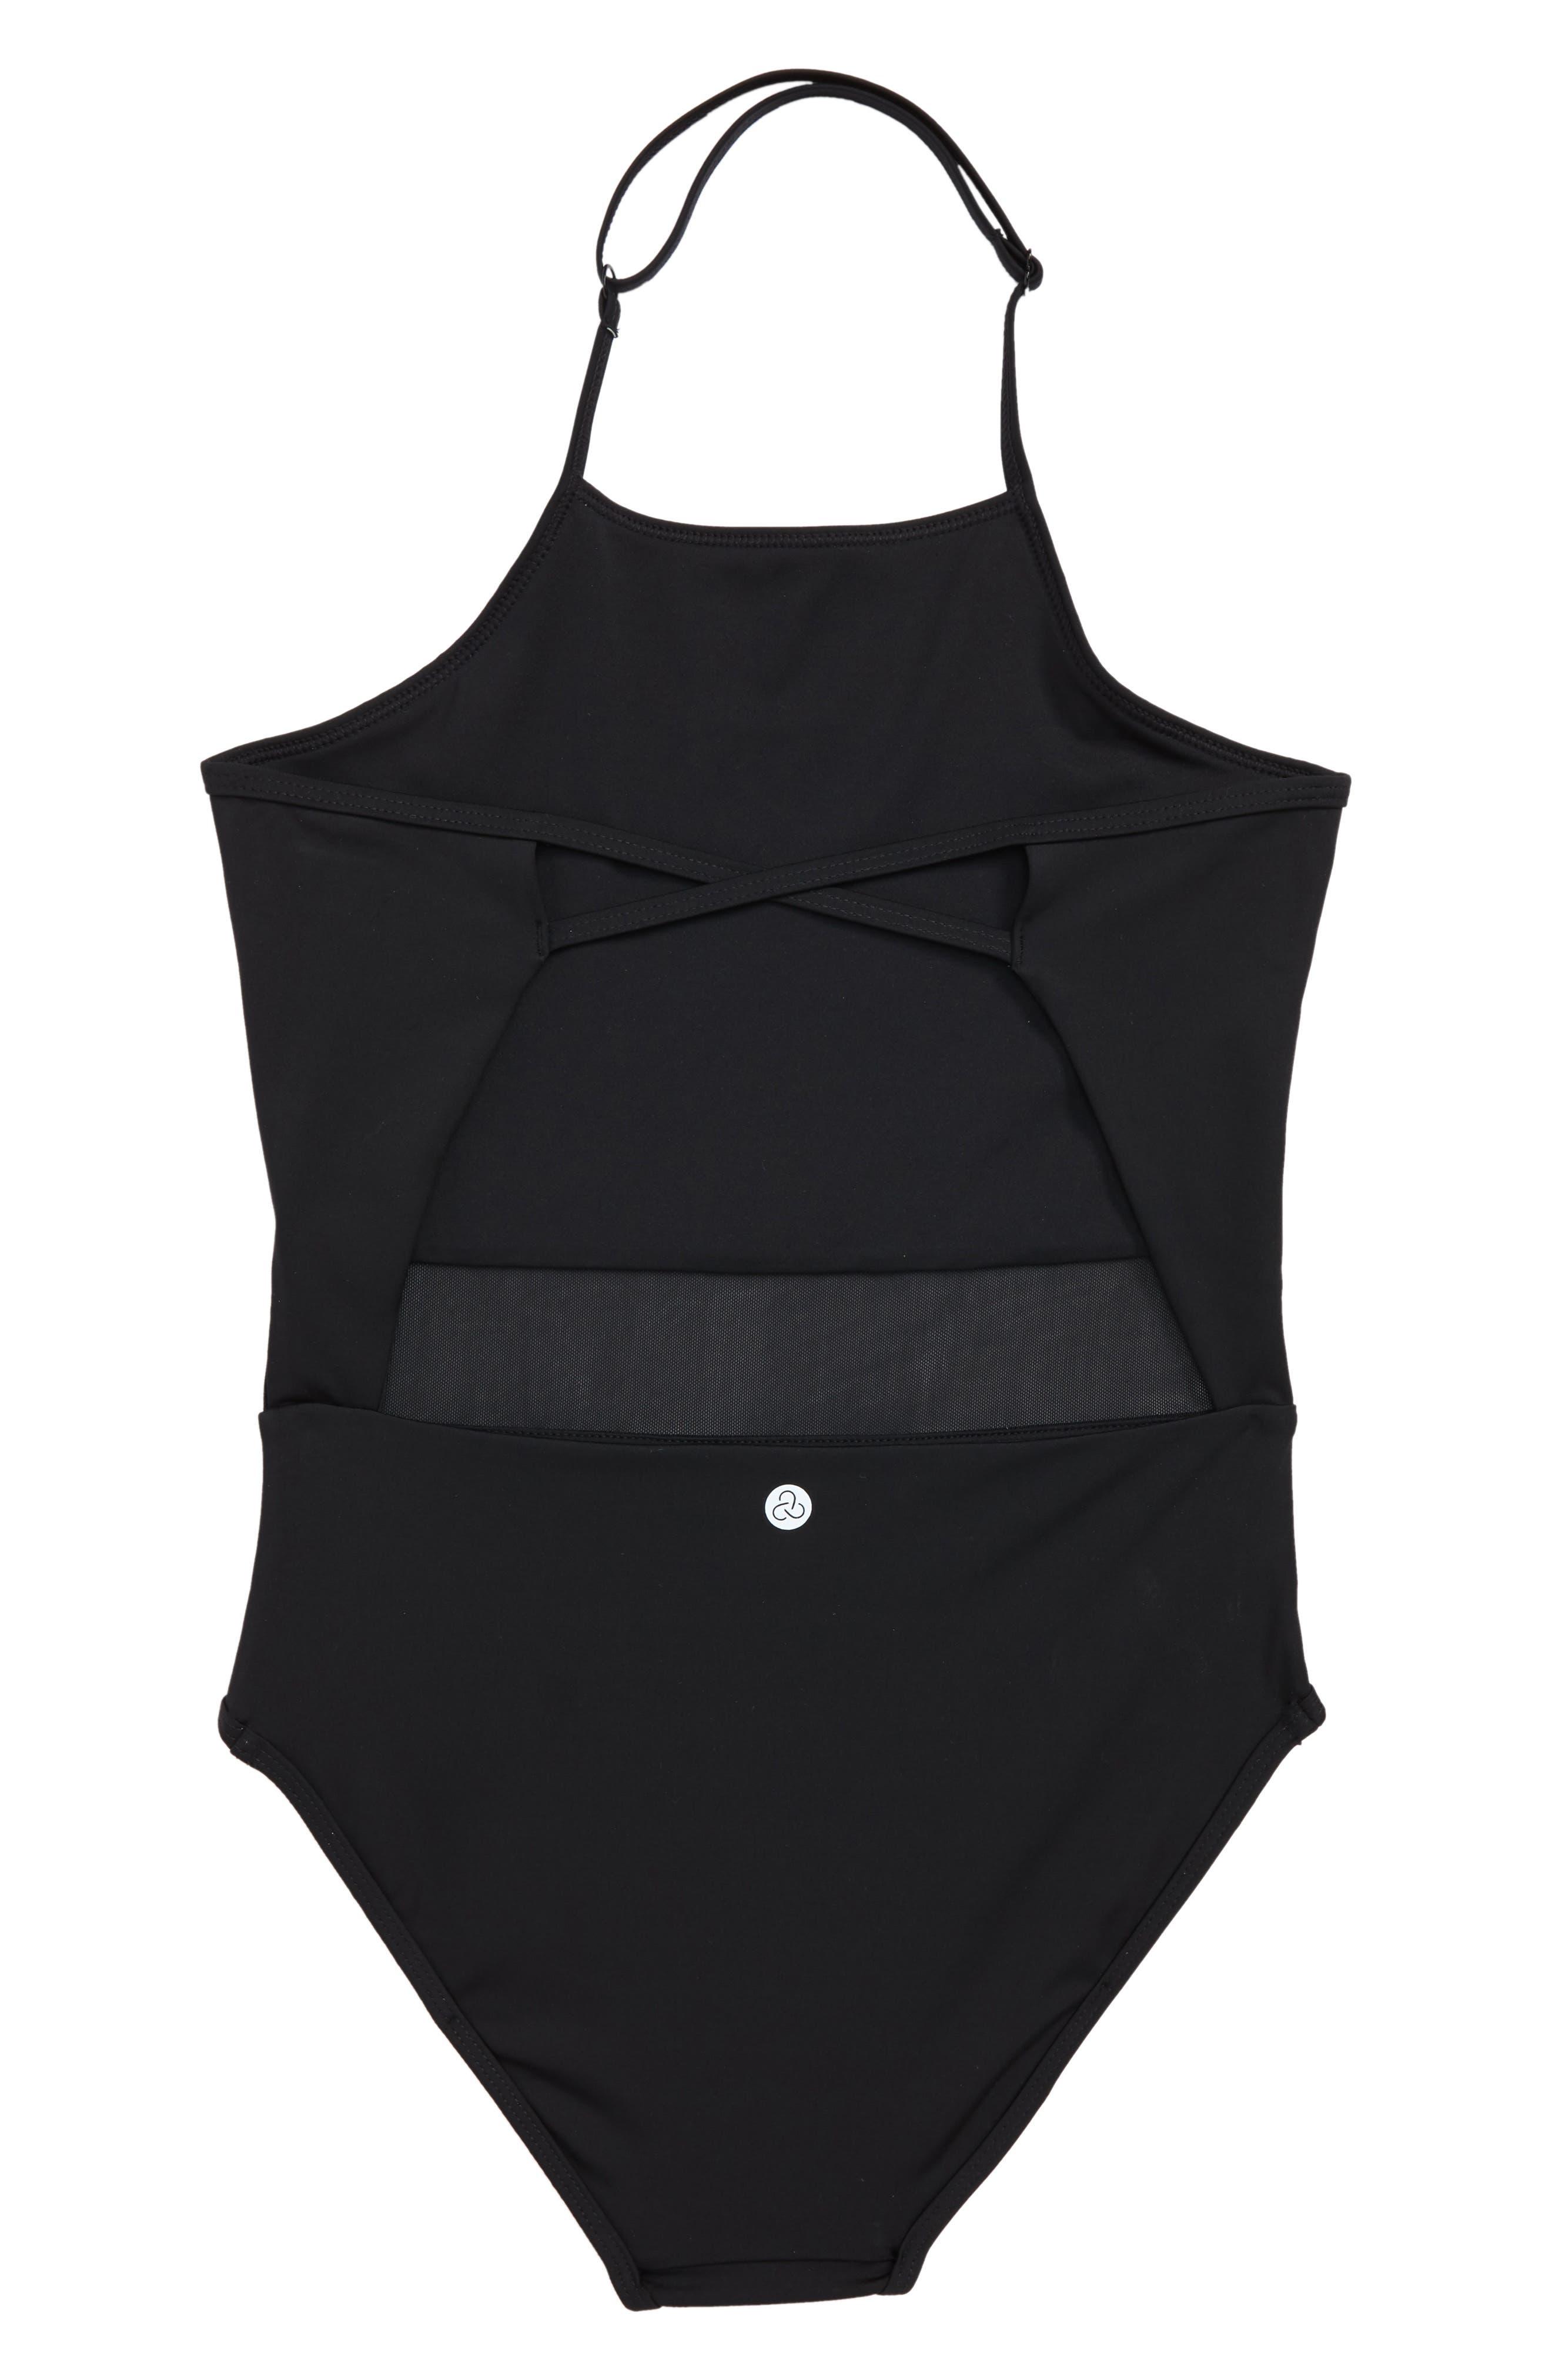 Horizon Mesh Inset One-Piece Swimsuit,                             Alternate thumbnail 2, color,                             001